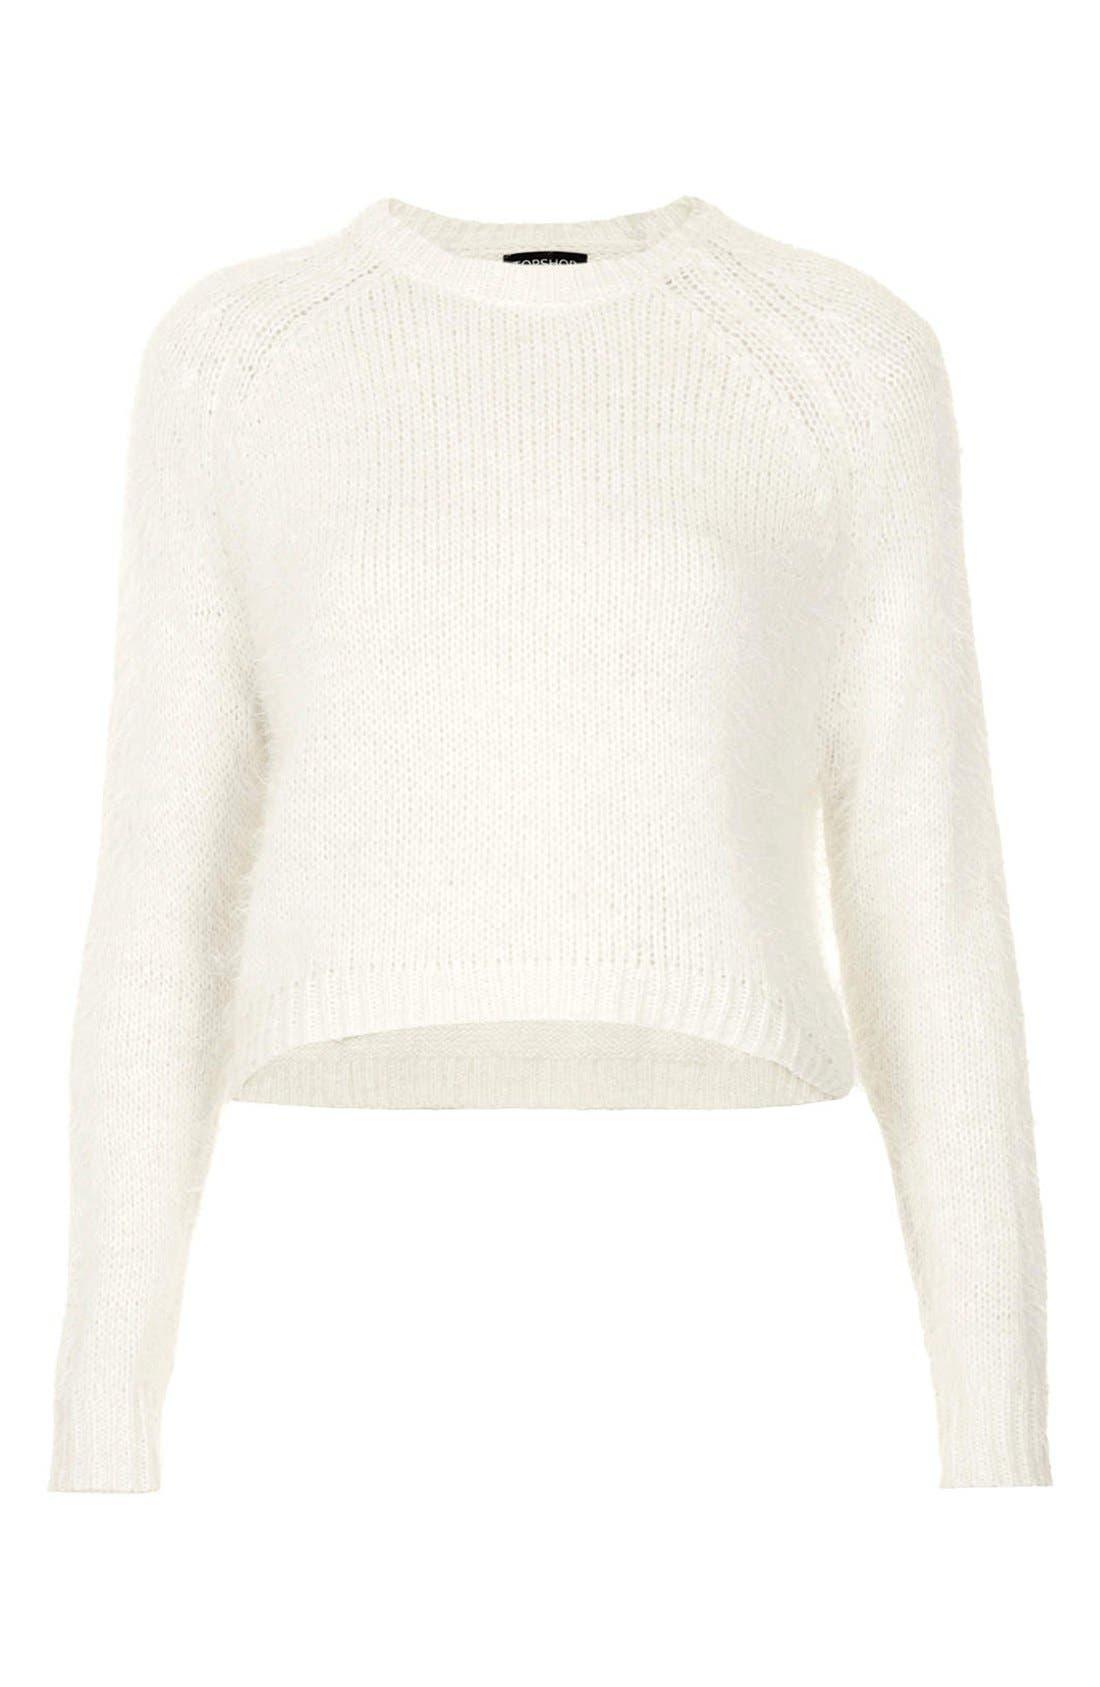 Alternate Image 3  - Topshop Textured Knit Sweater